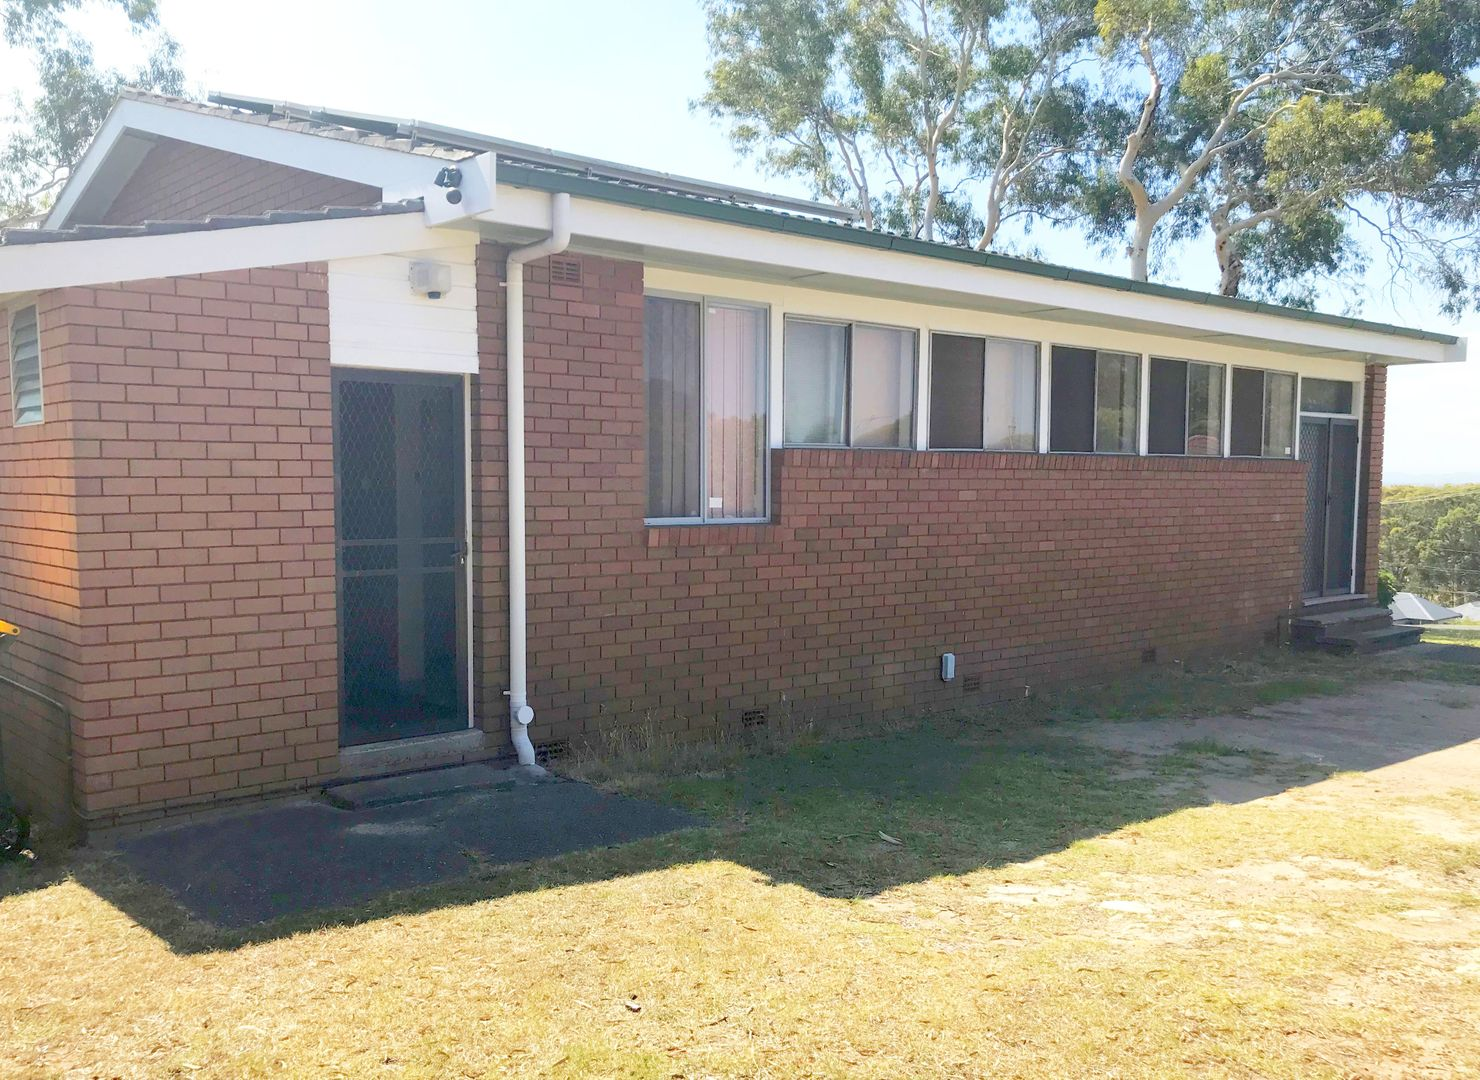 43 Acacia Avenue, Waratah West NSW 2298, Image 0